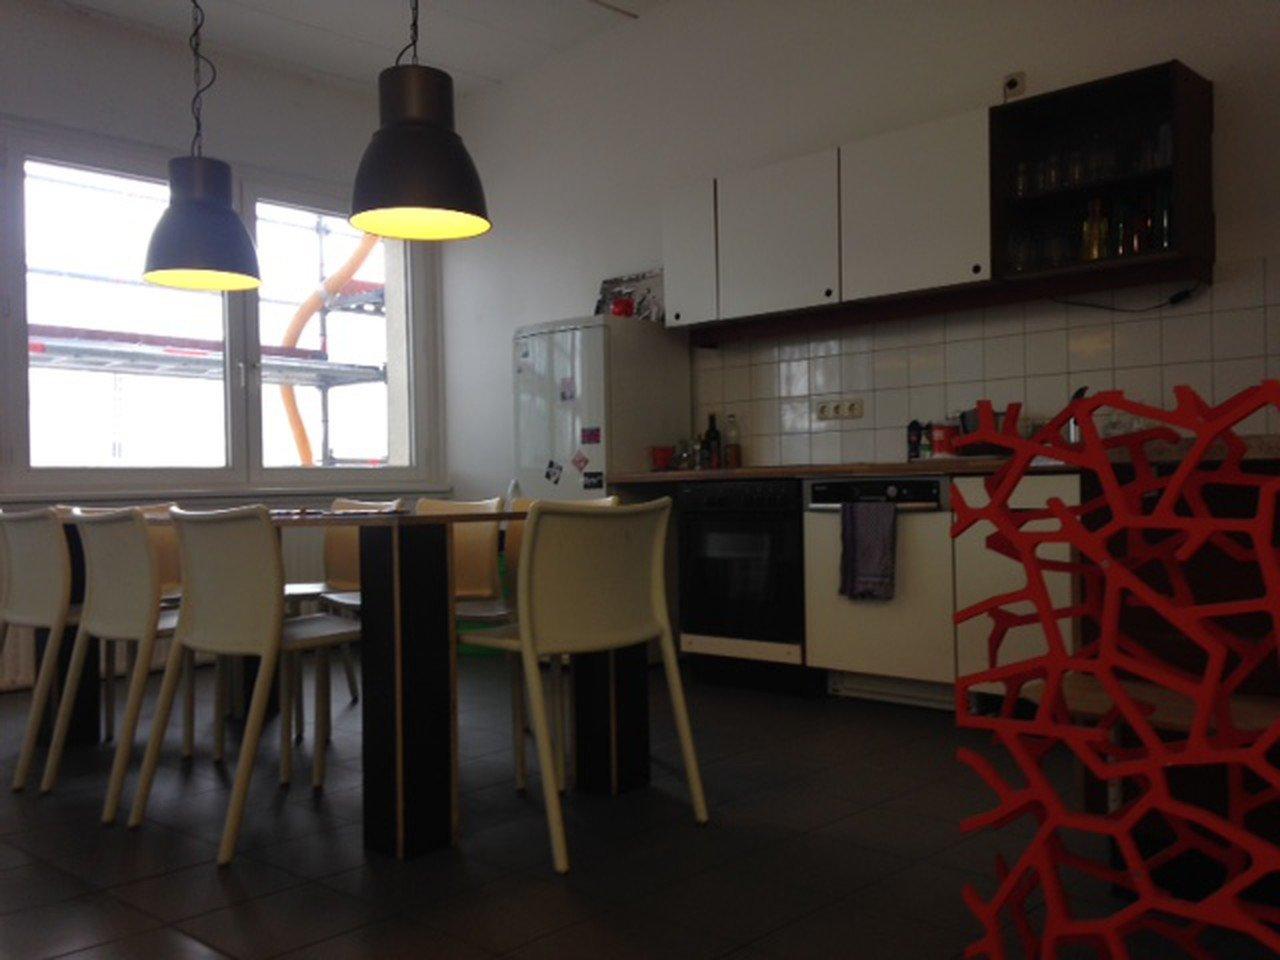 Hamburg workshop spaces Coworking Space Industrielles Loft image 0